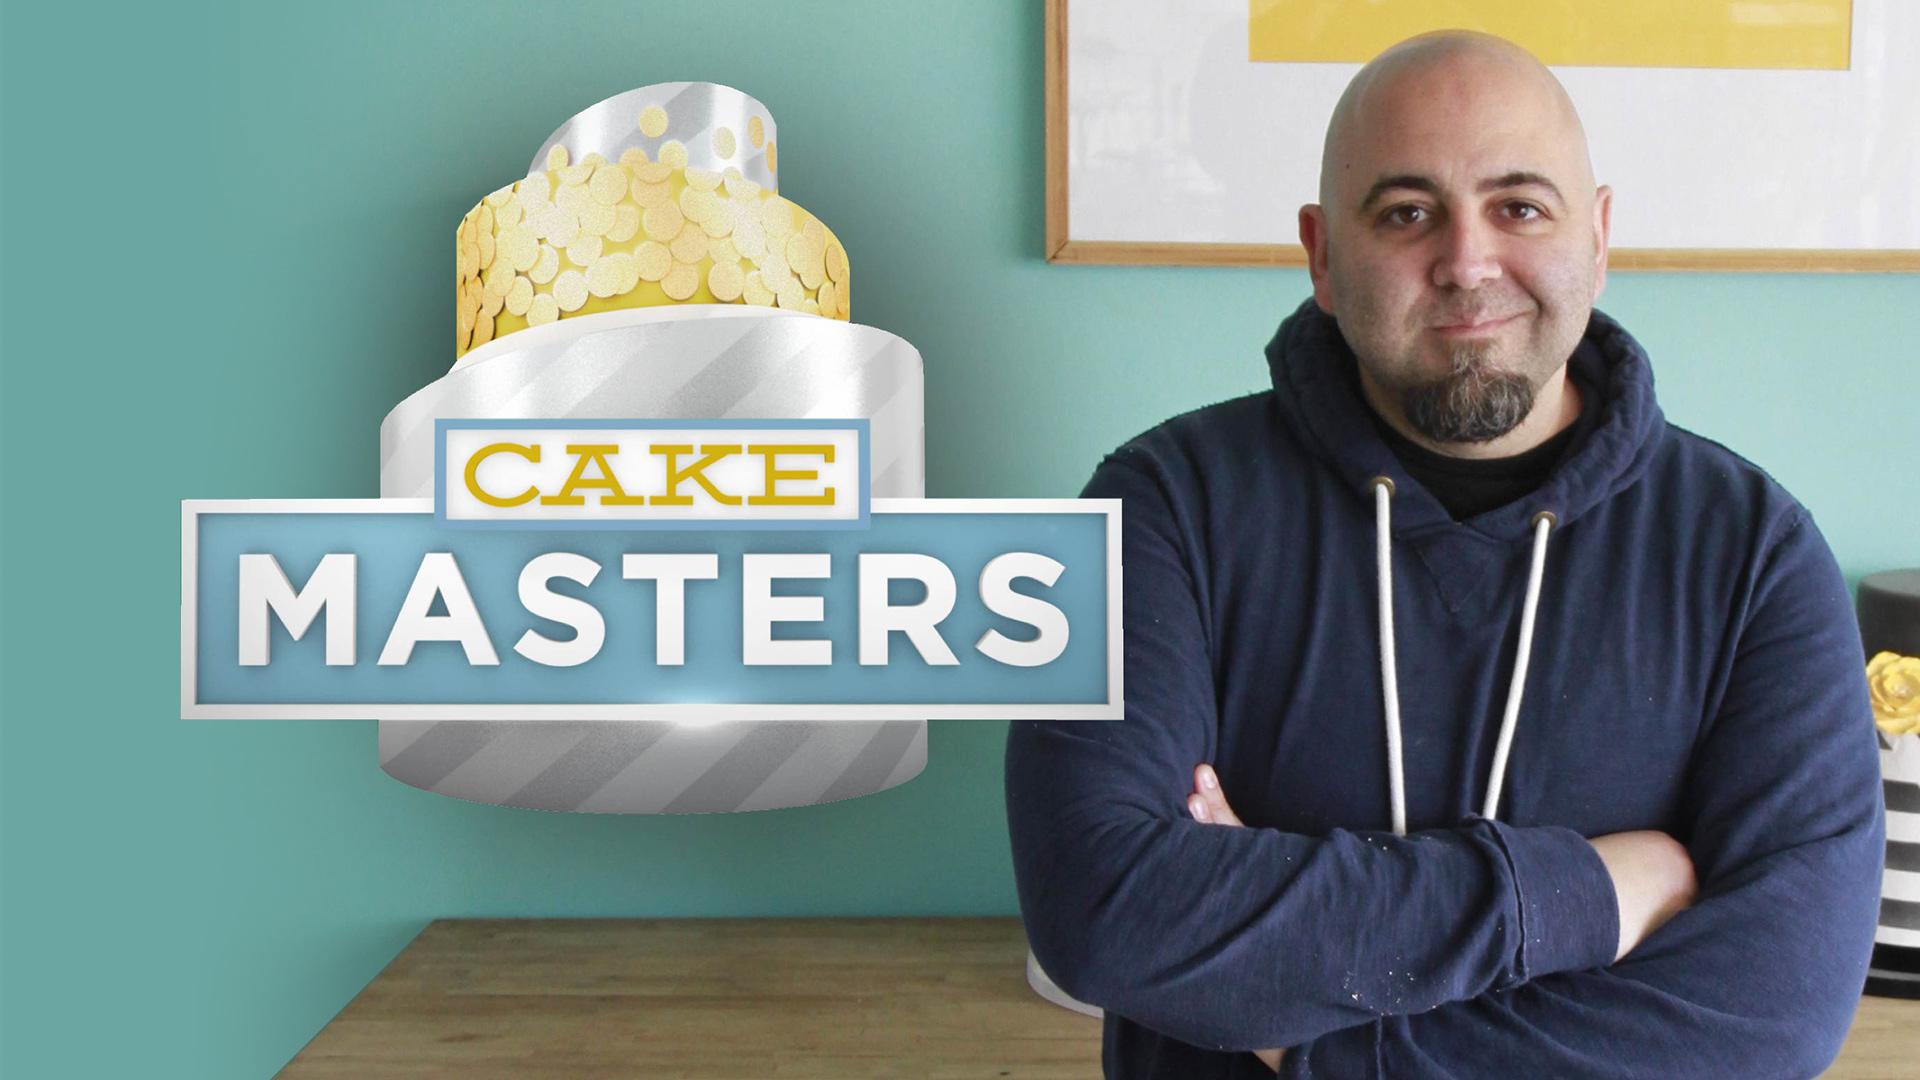 Cake Masters, Season 1